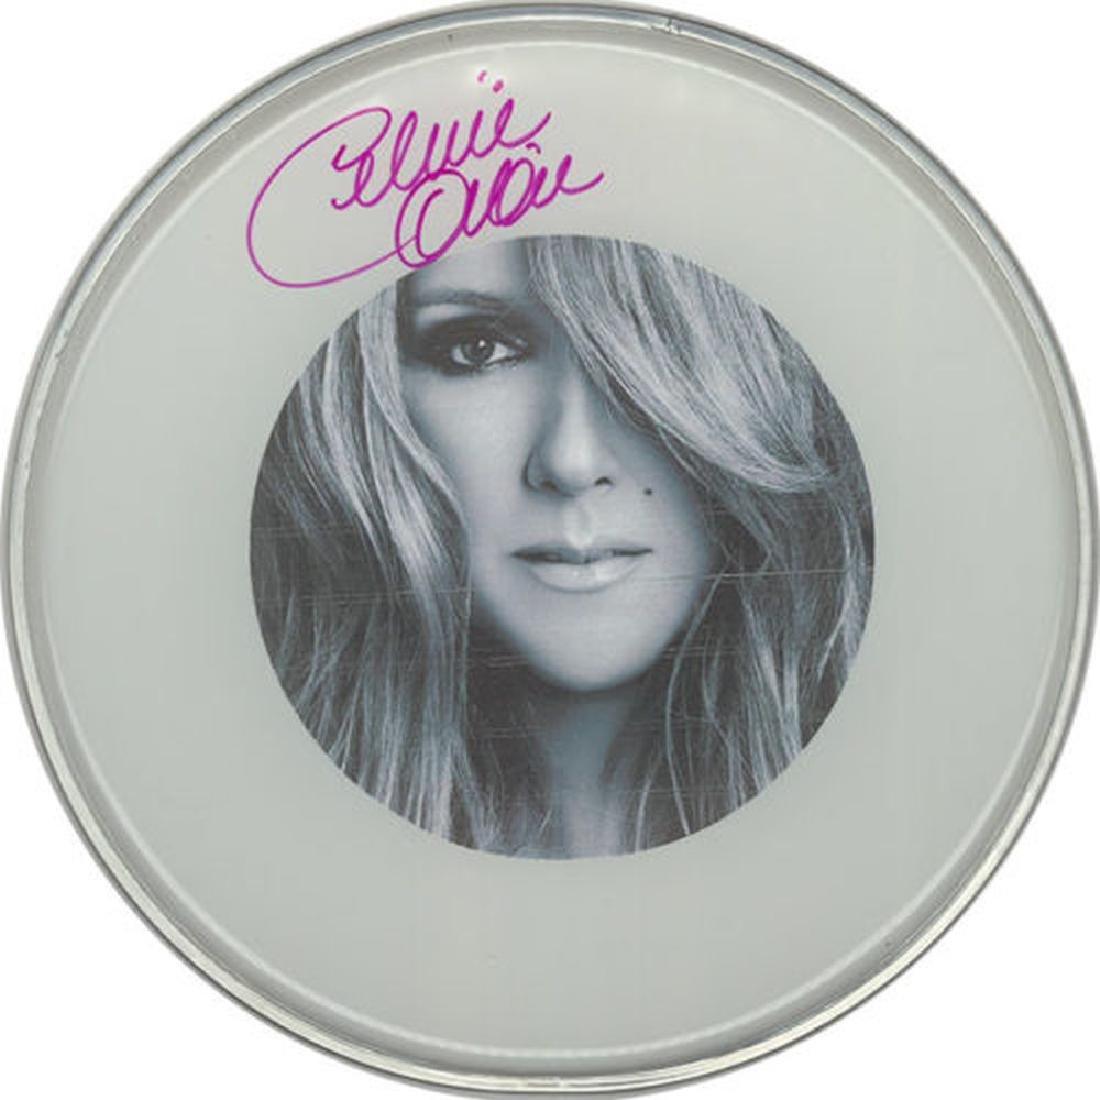 Celine Dion Signed Drumhead